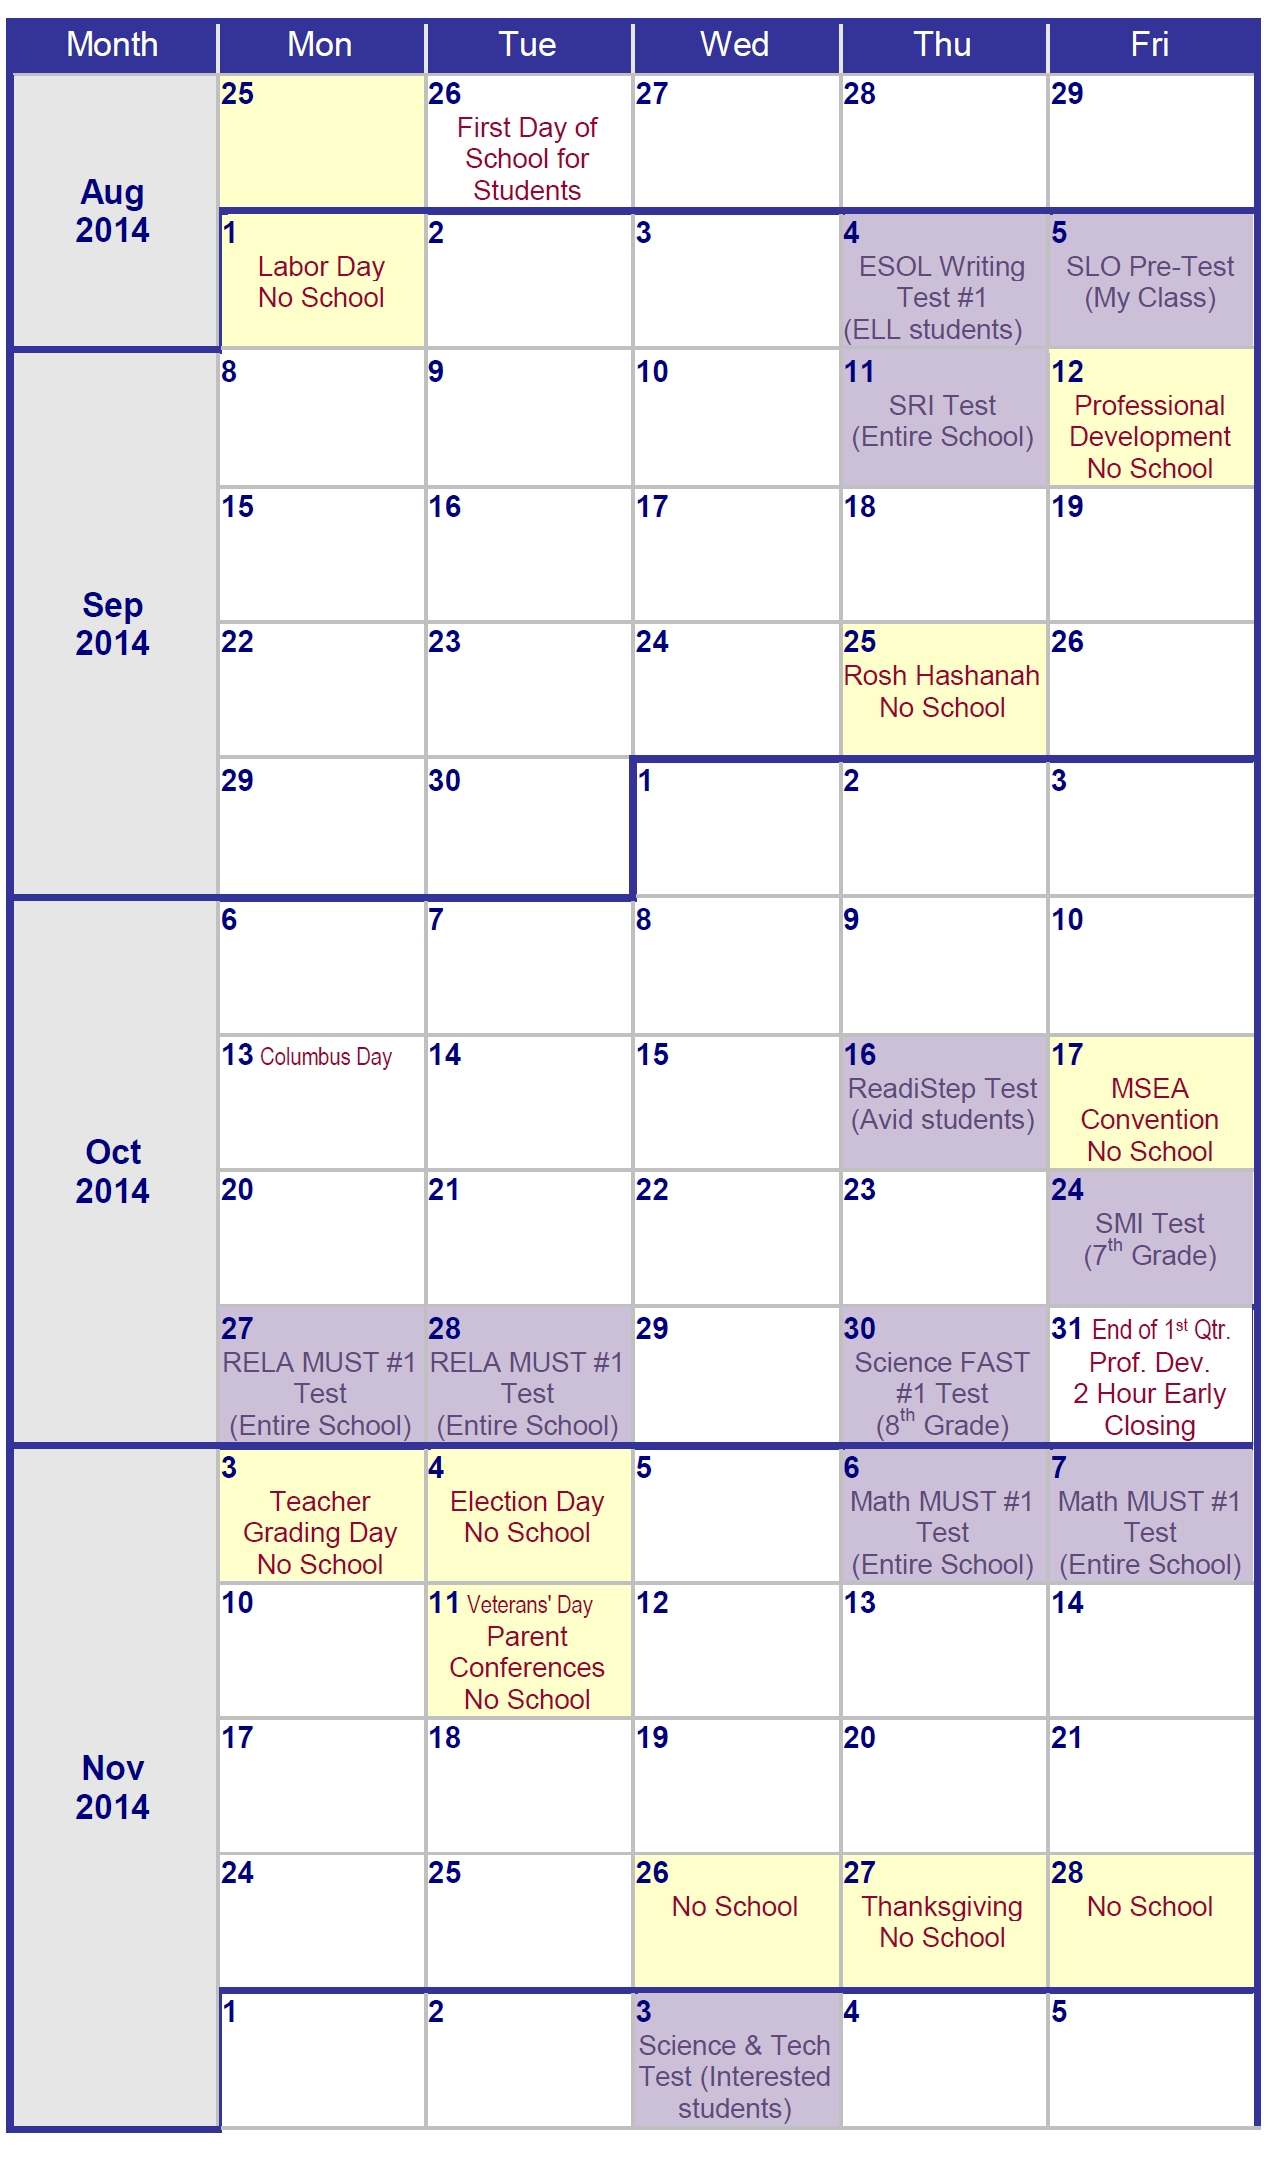 One Local Middle School's Testing Calendar – Prince George's County_P.g. County School Calendar